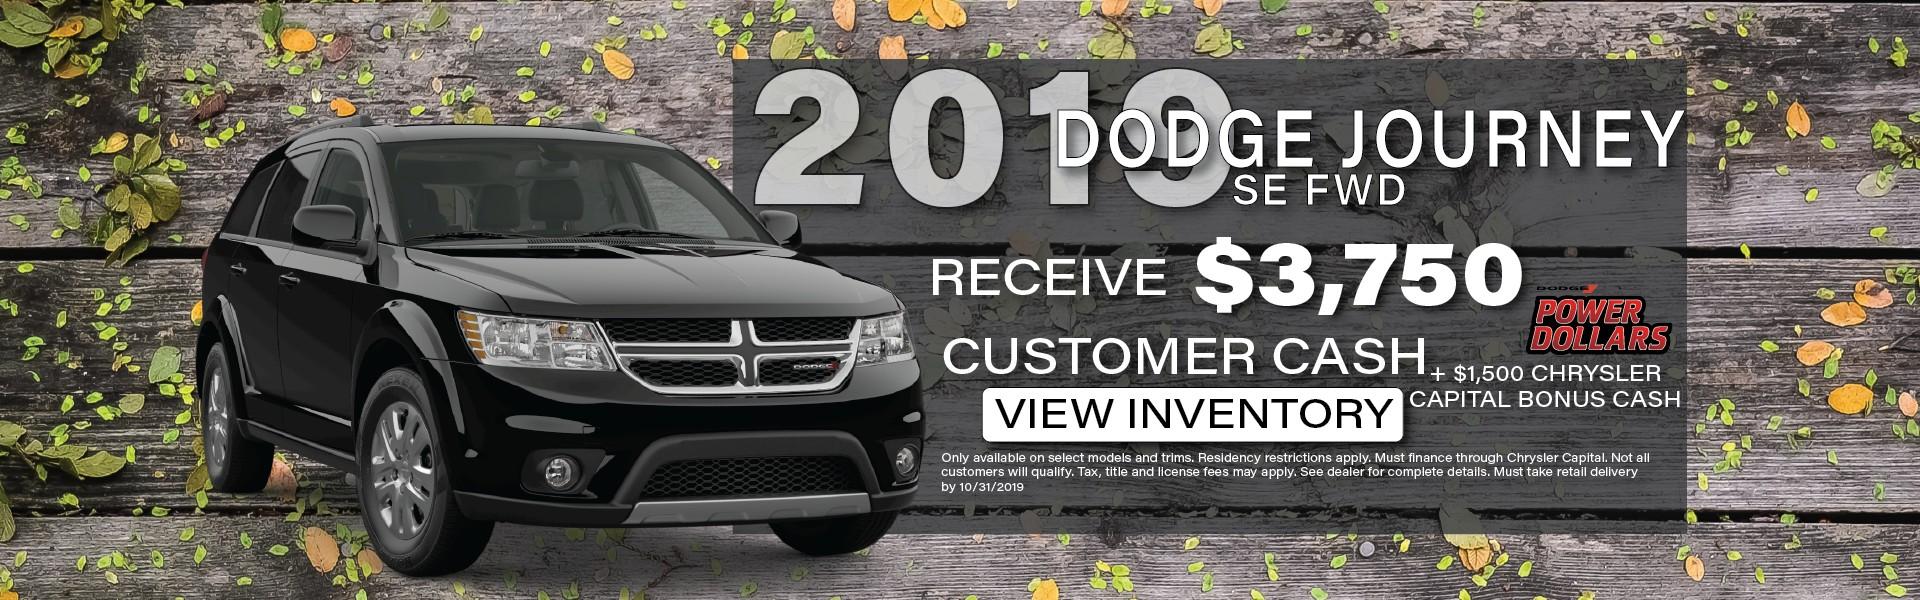 2019 Dodge Journey, Manitowoc WI